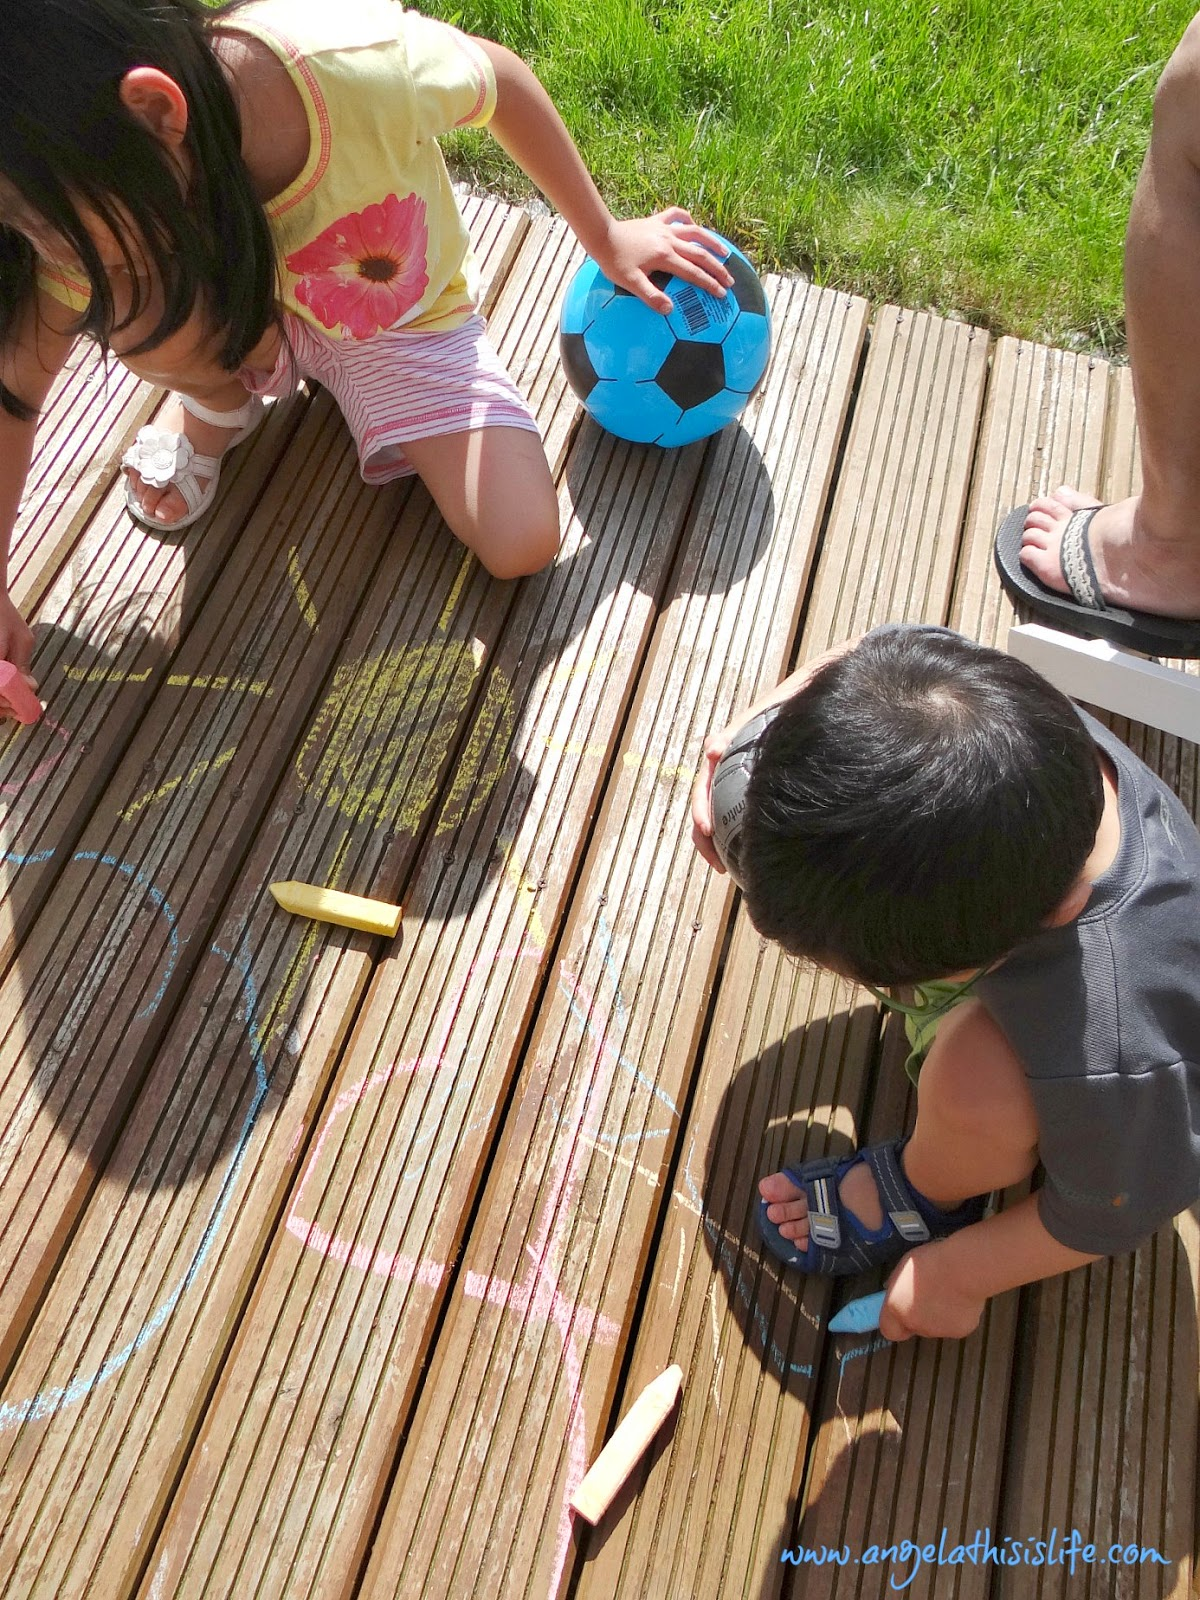 Crayola, Back to School, child safe stationery